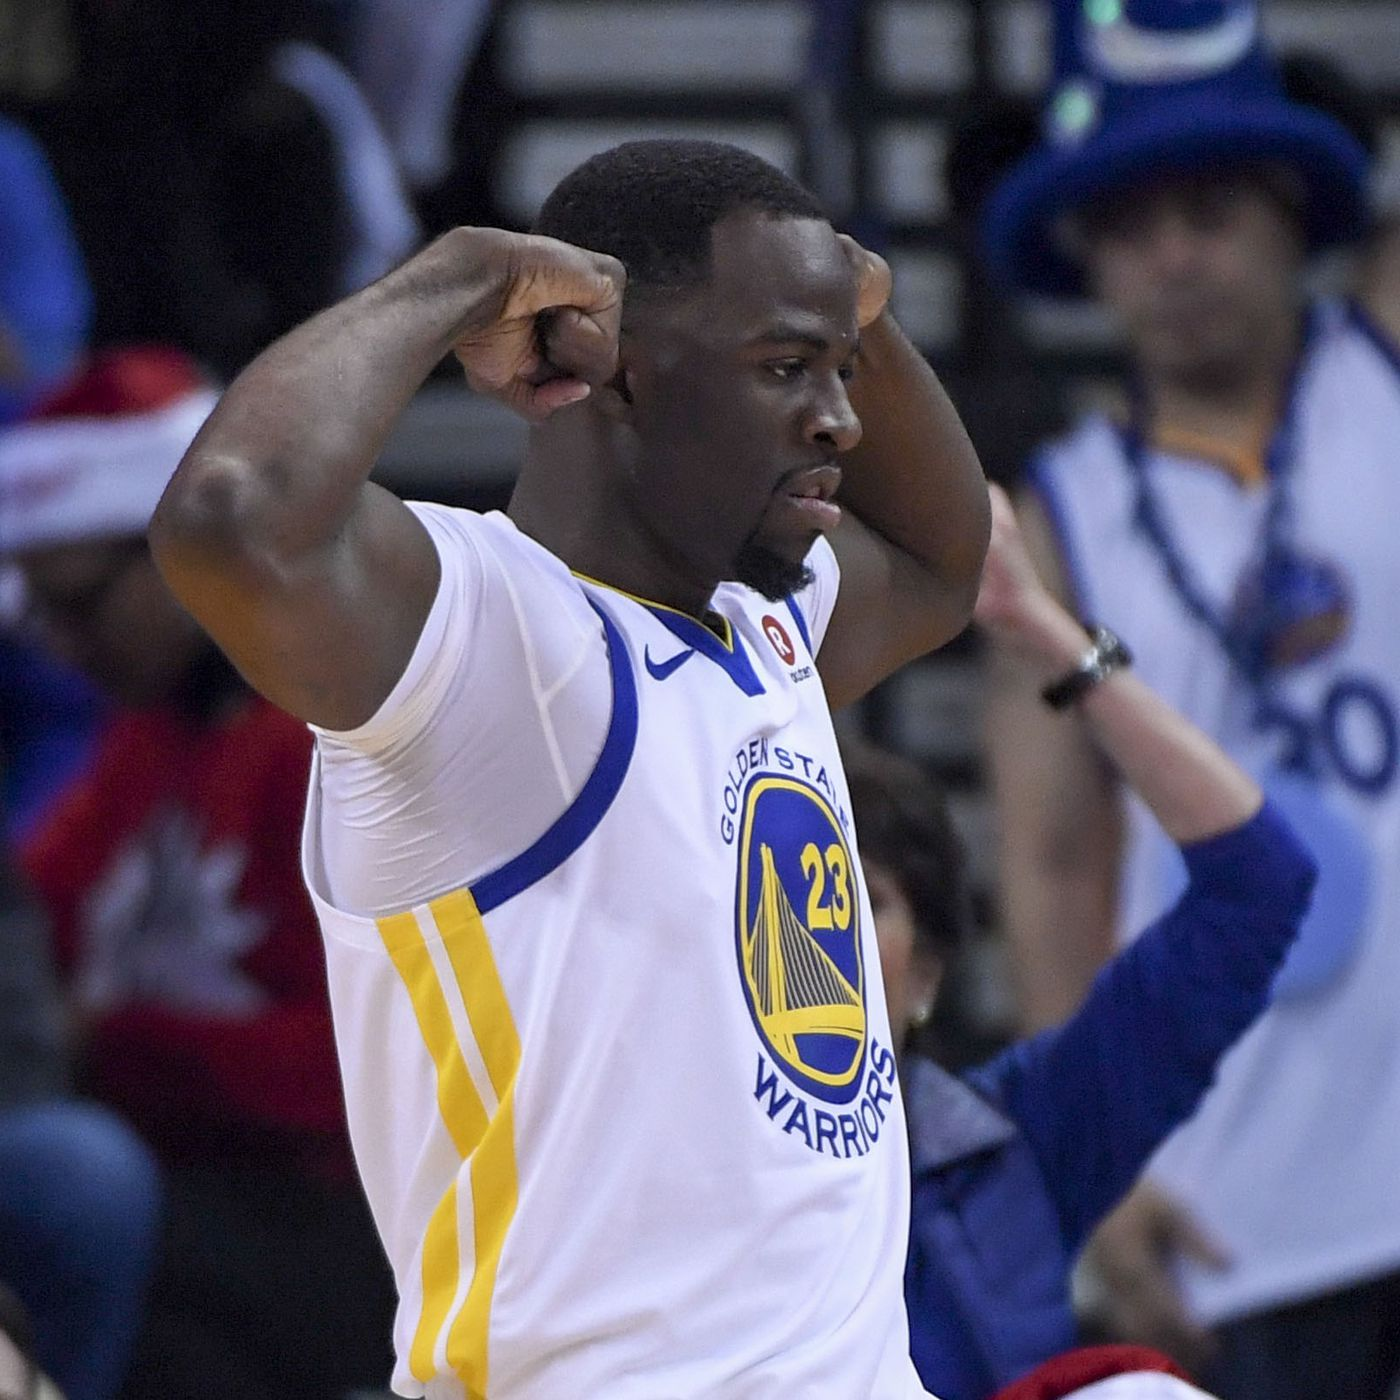 b630810dbd5 Warriors highlights  Draymond Green s triple-double helps beat Cavs ...